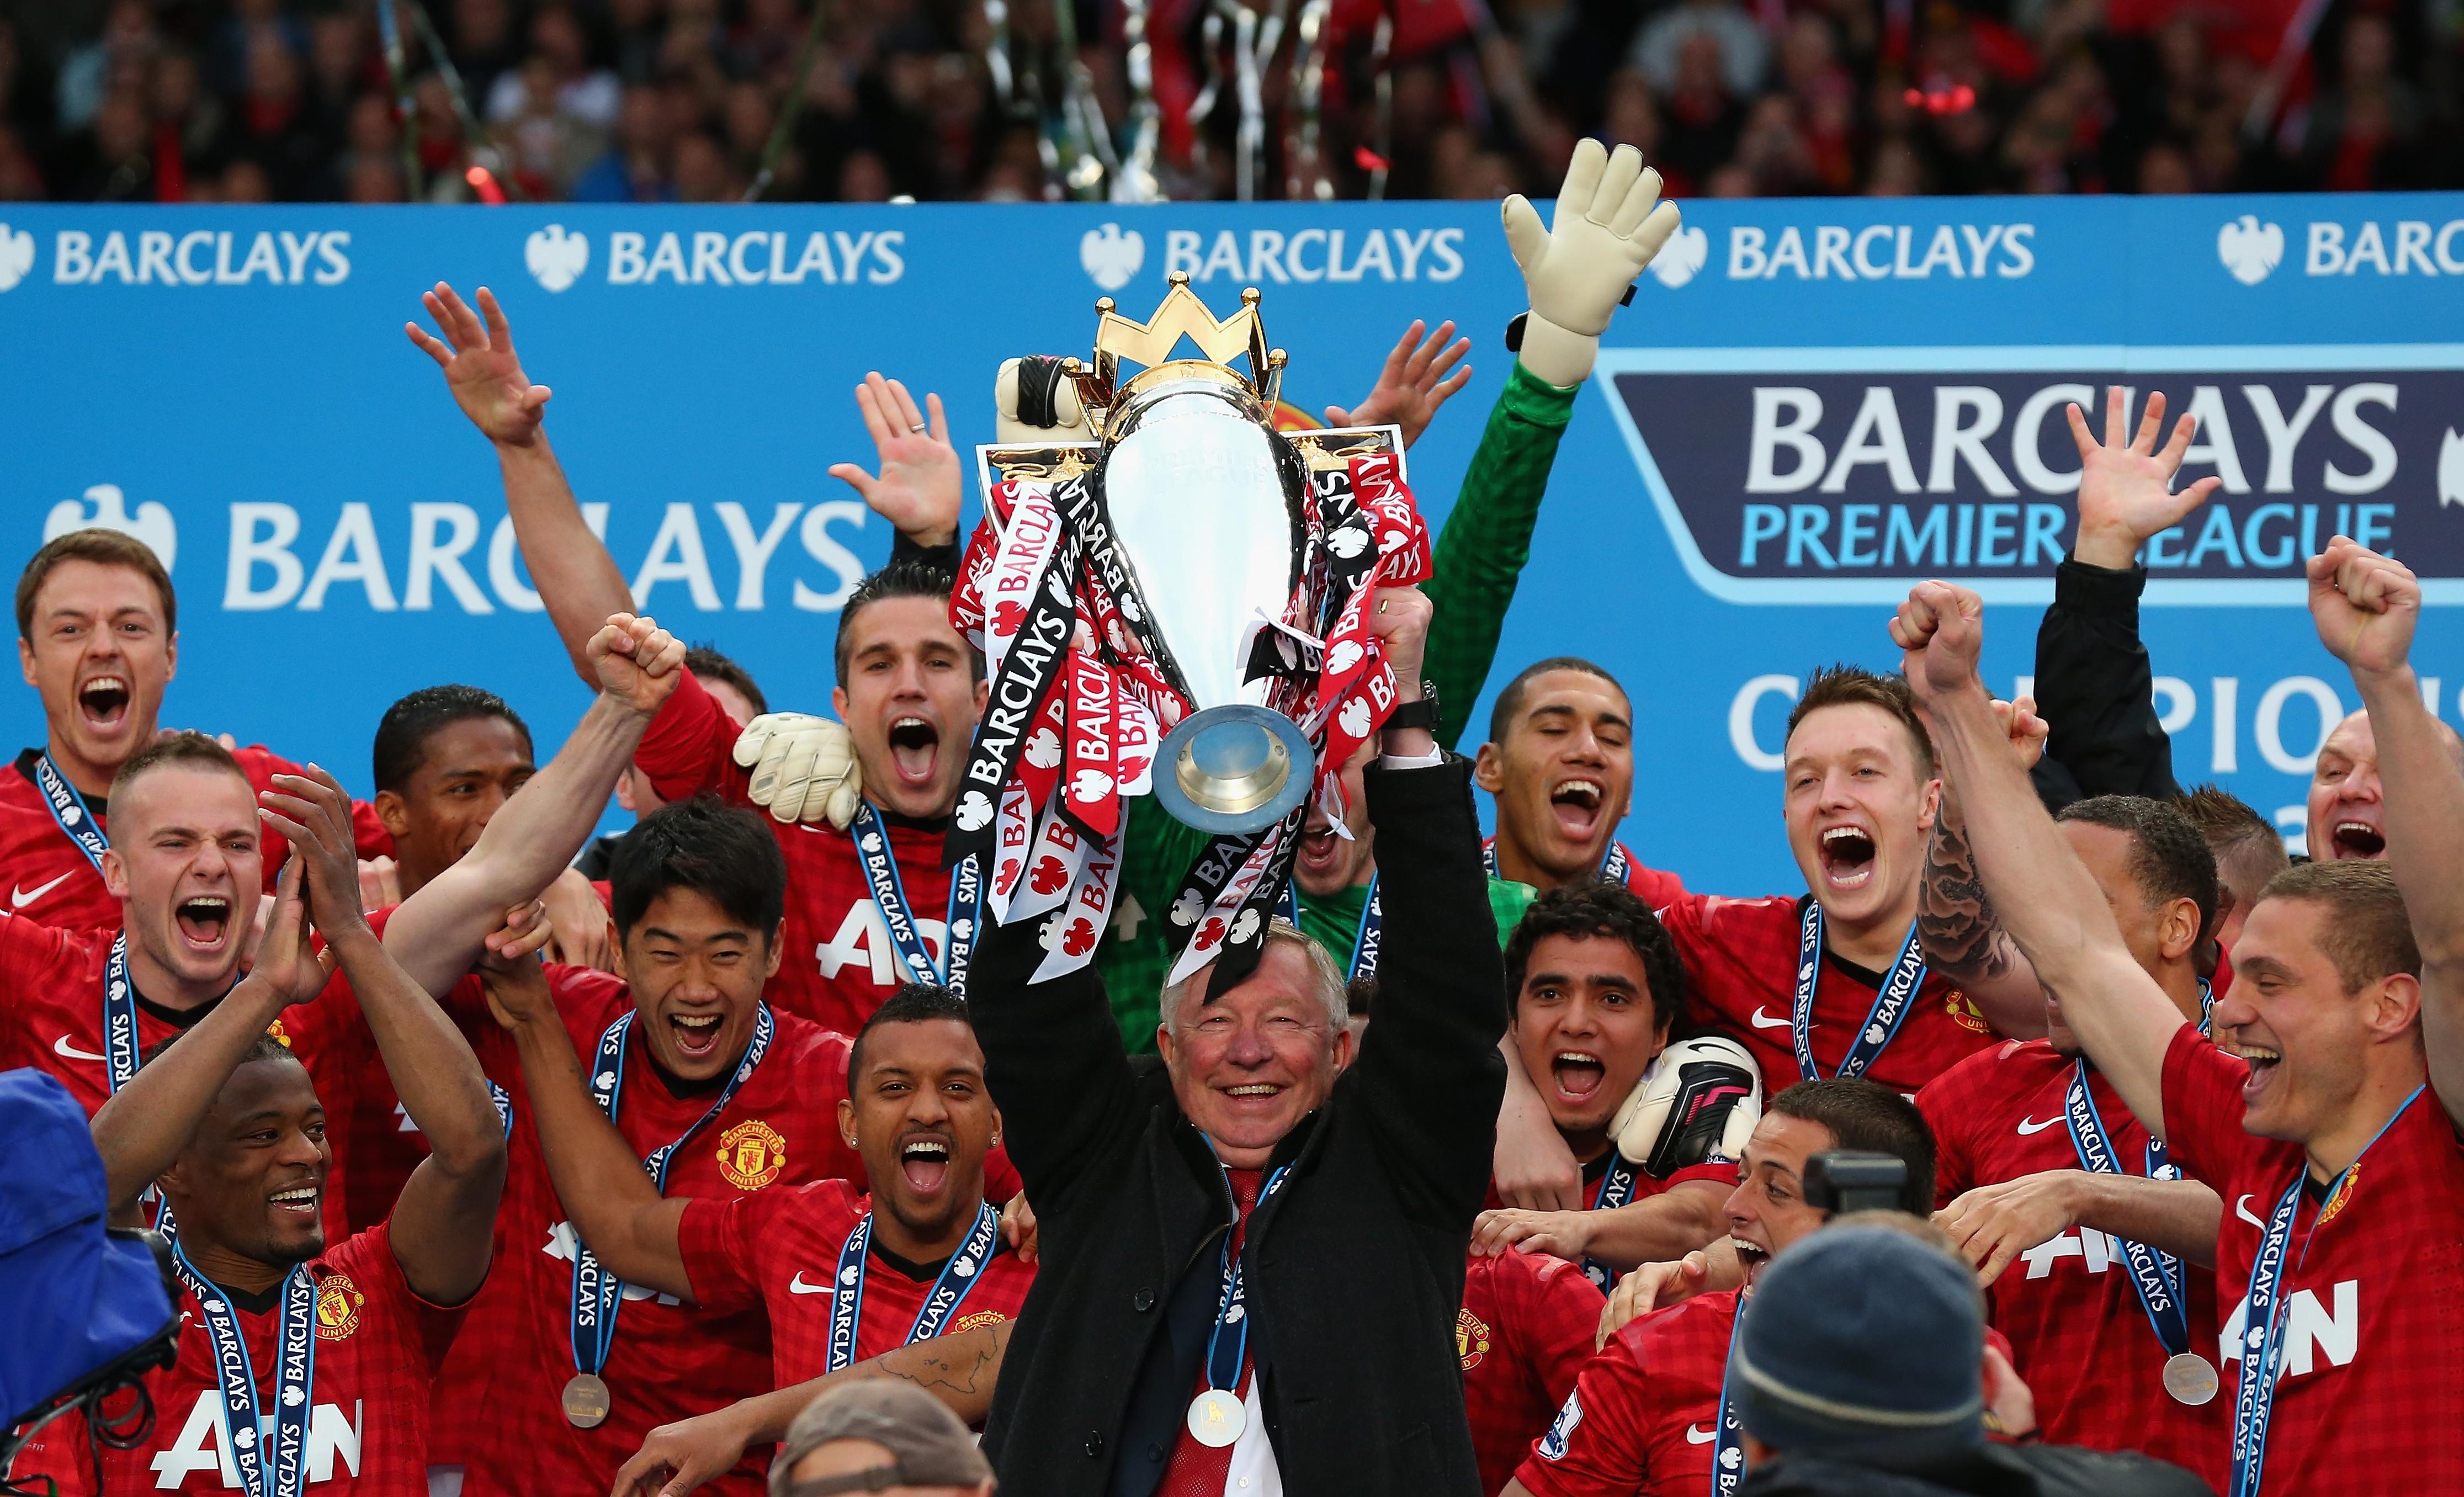 Manchester-United-v-Swansea-City-Premier-League-1571657478.jpg